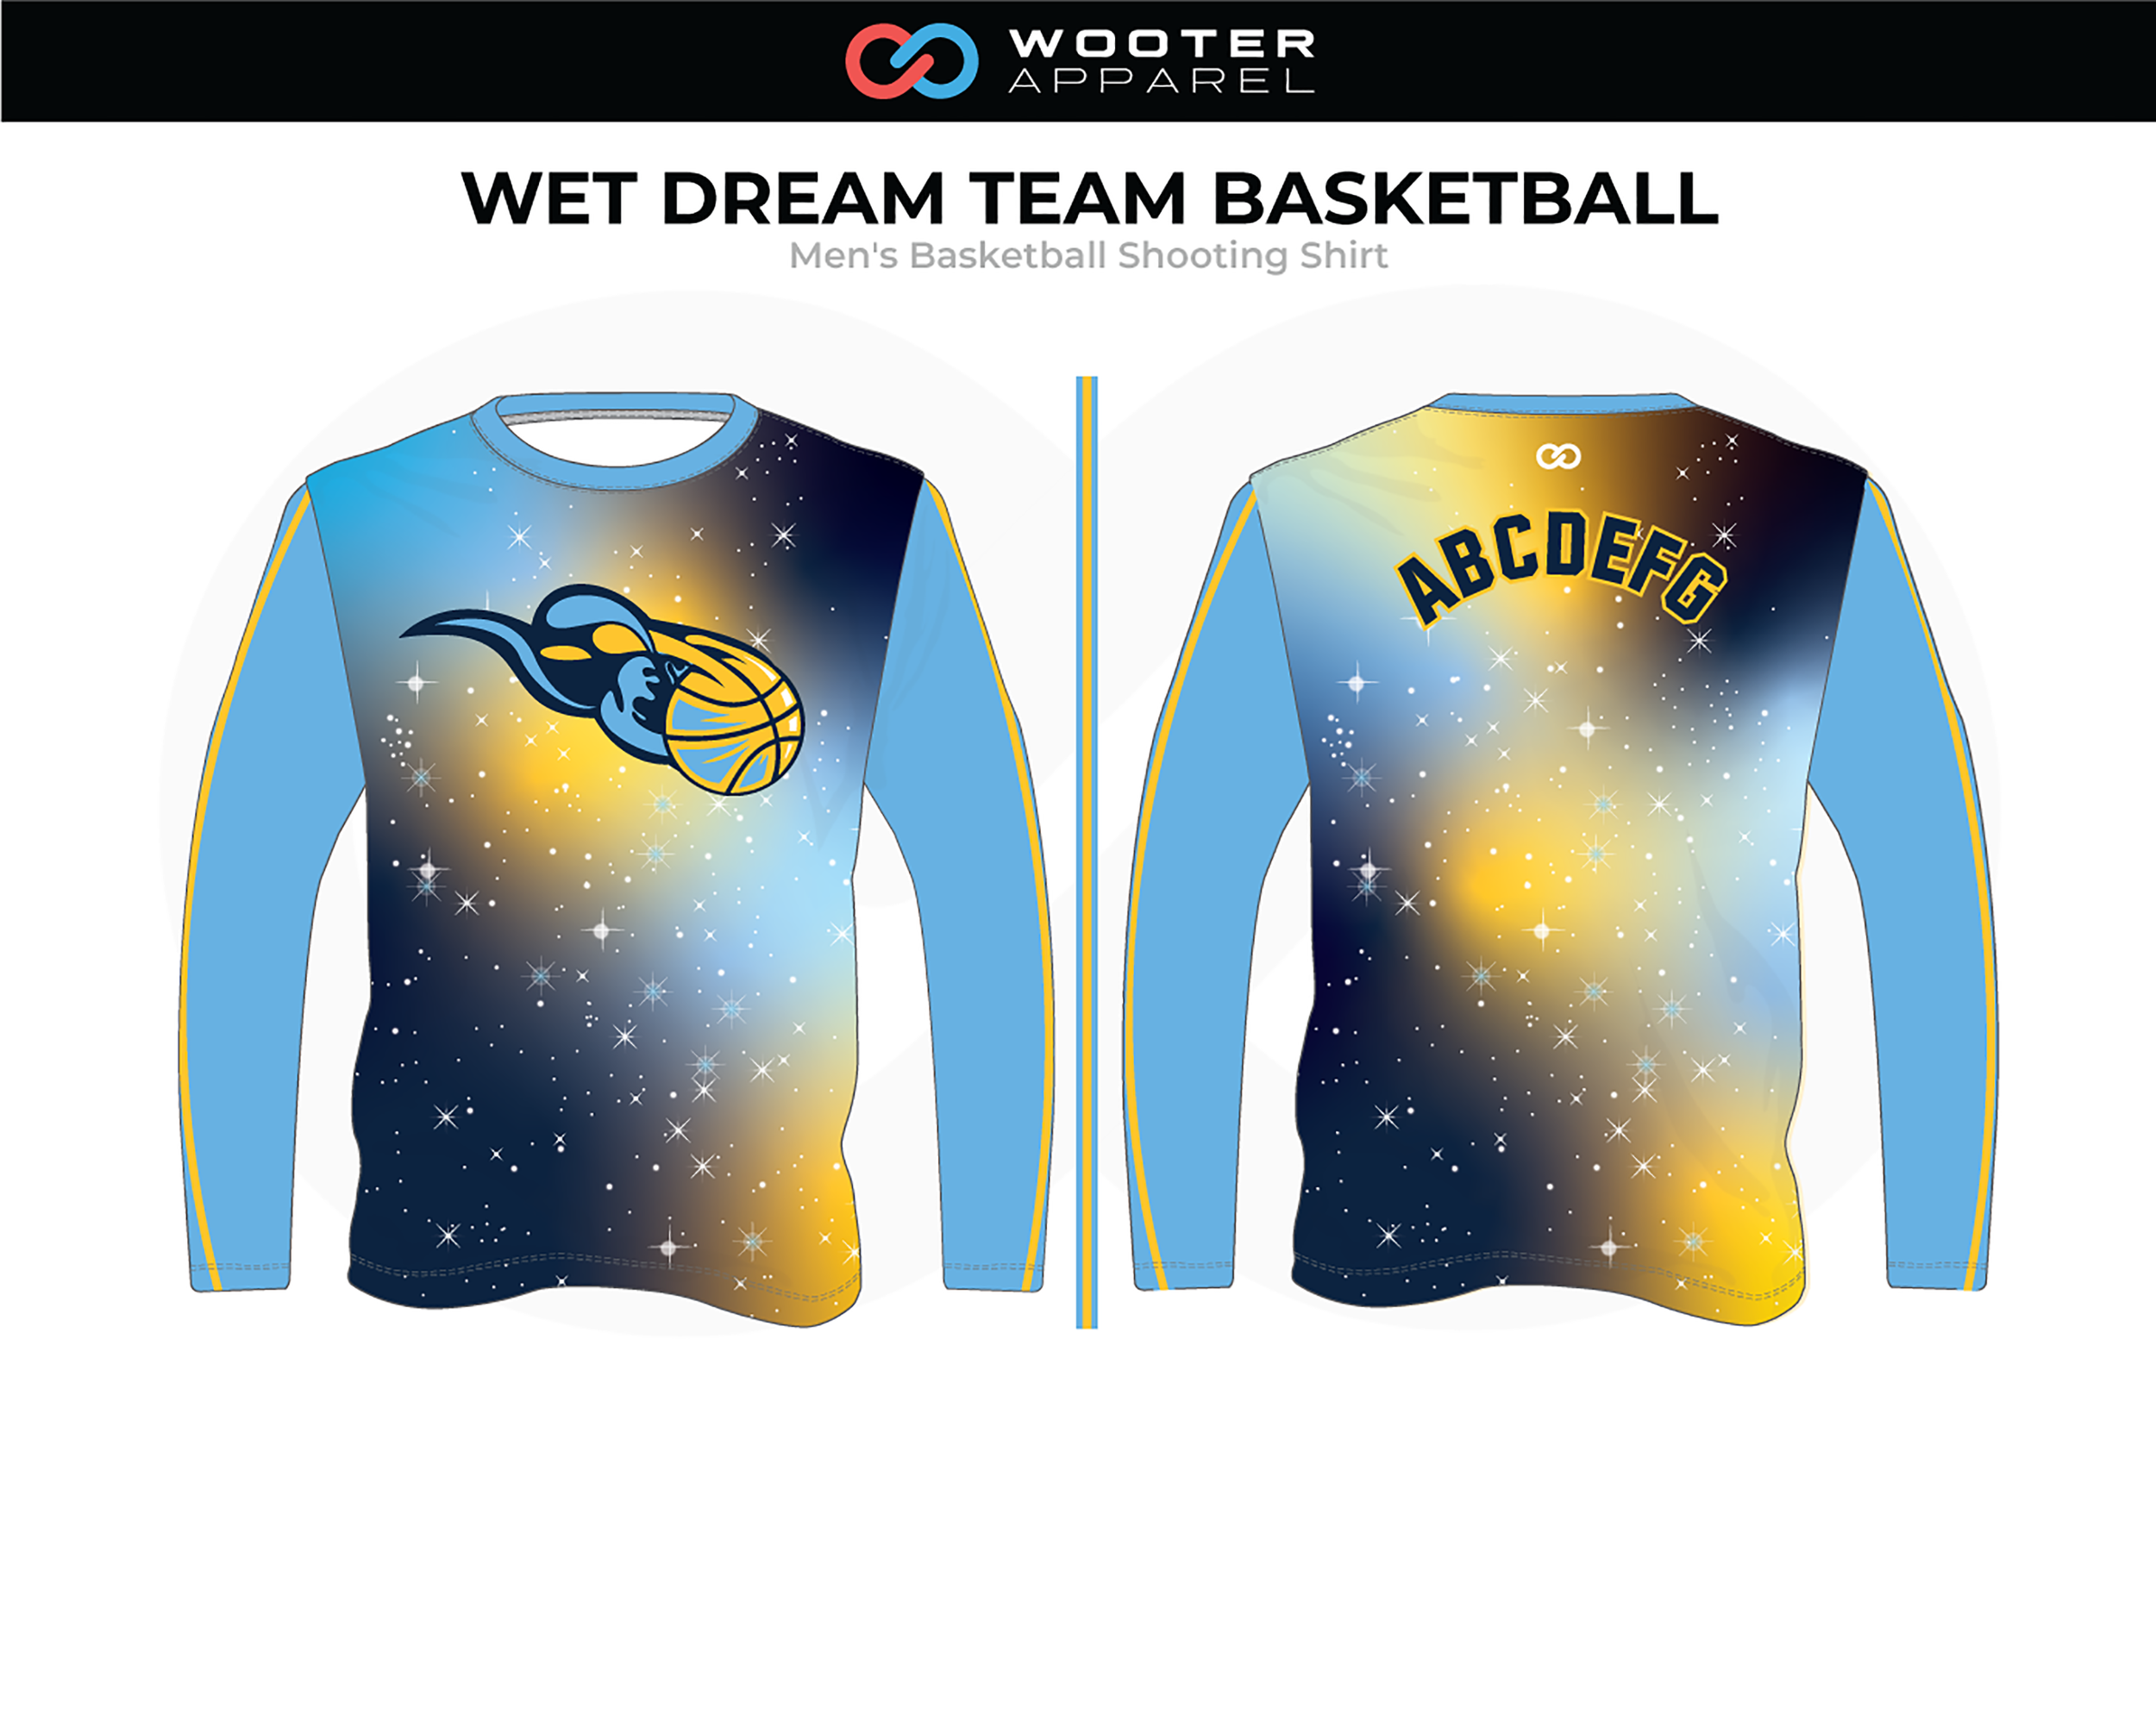 WET DREAM TEAM Blue Yellow Black Men's Basketball Shooting Shirt